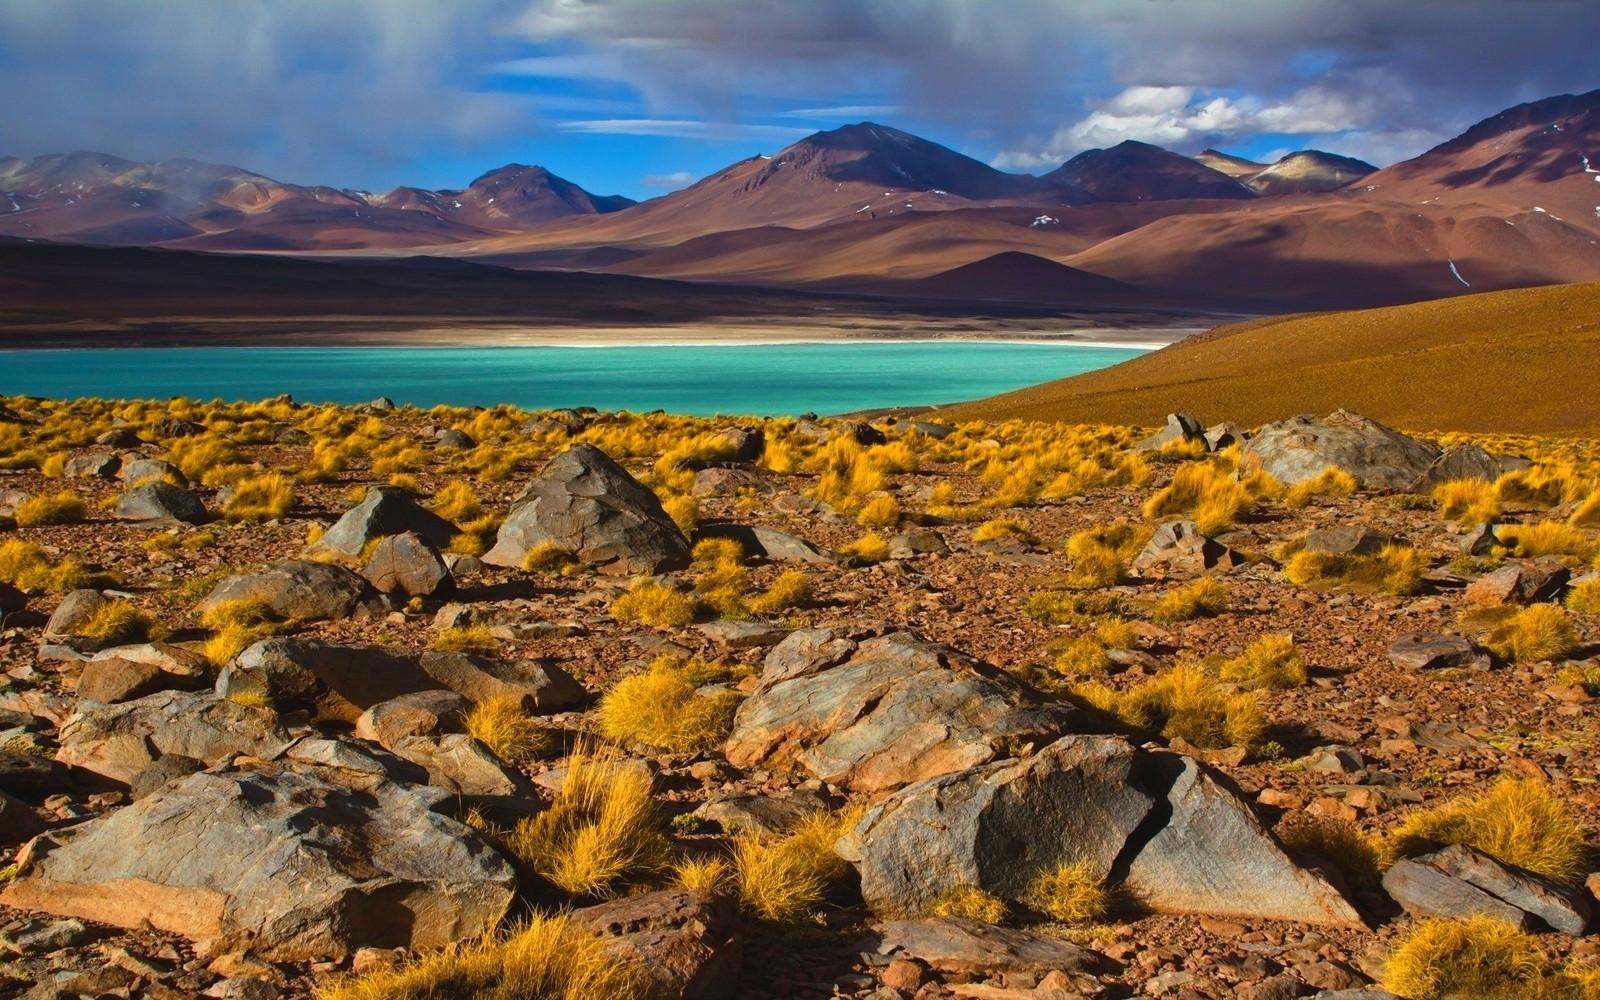 General 1600x1000 nature landscape photography lake shrubs mountains Atacama Desert Chile